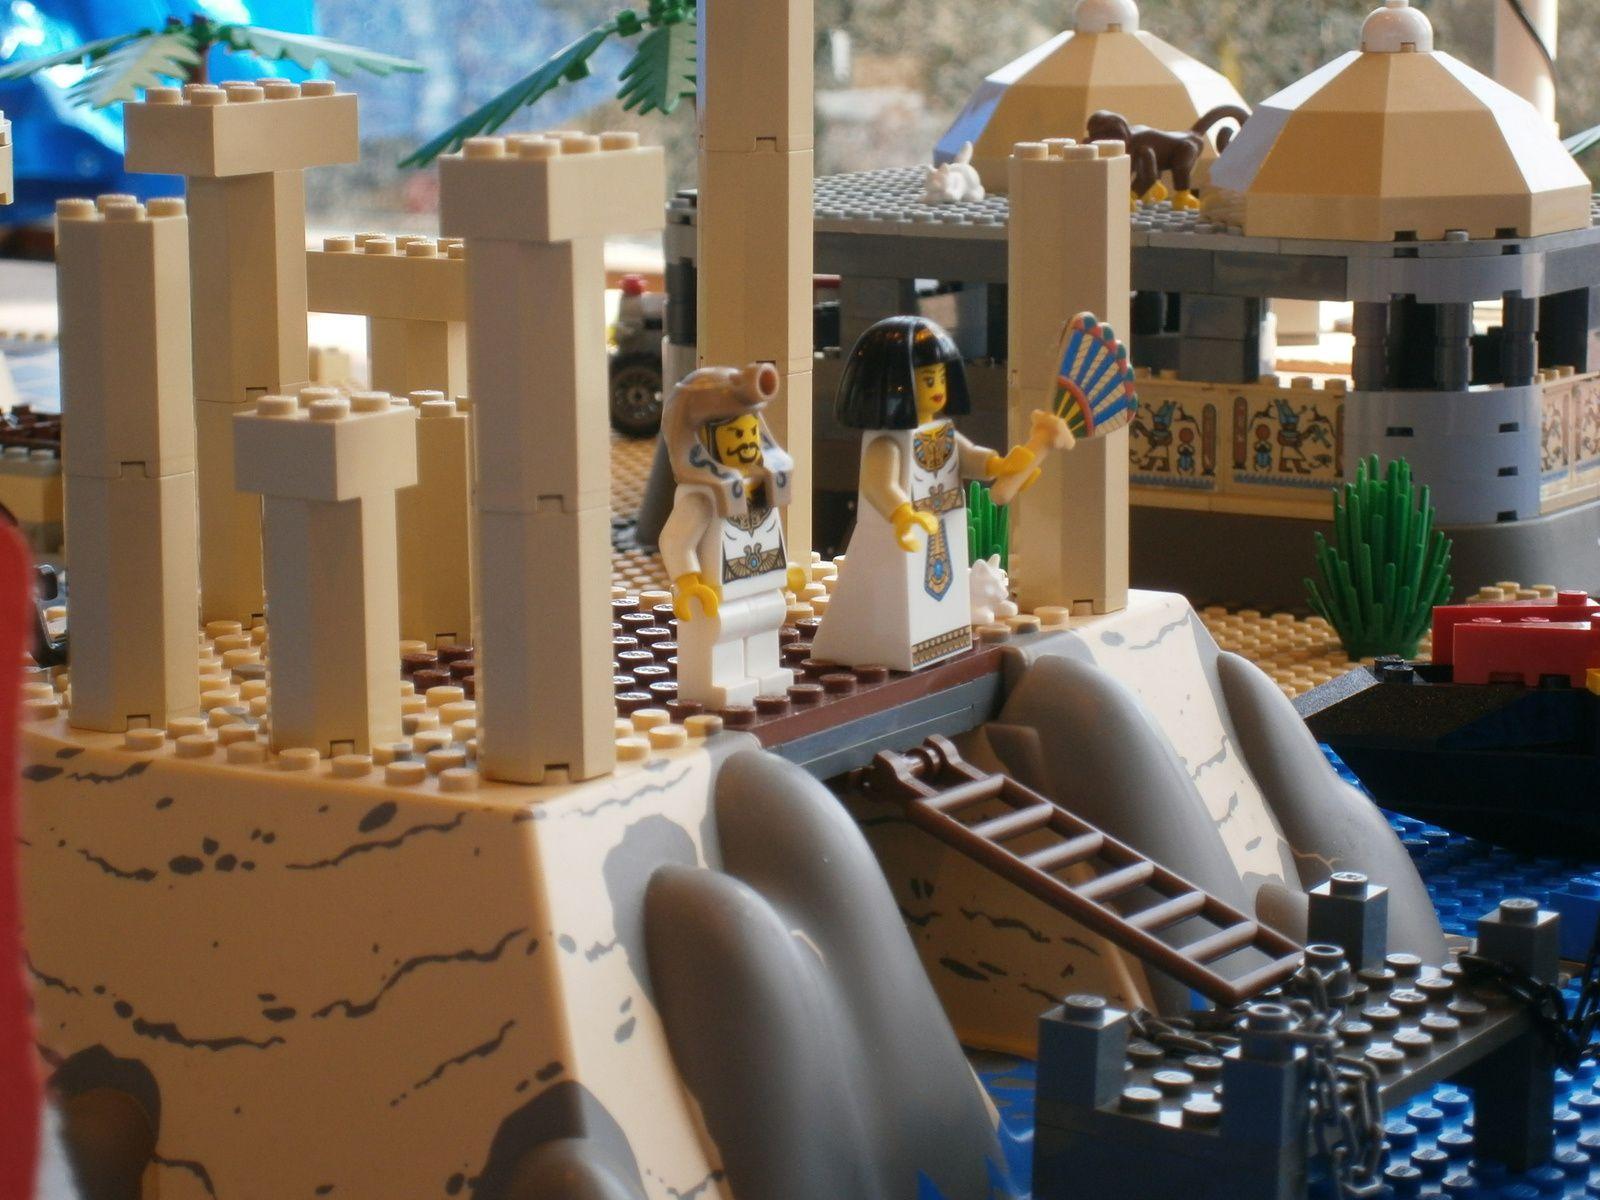 Grosse scène Egypte - Lego